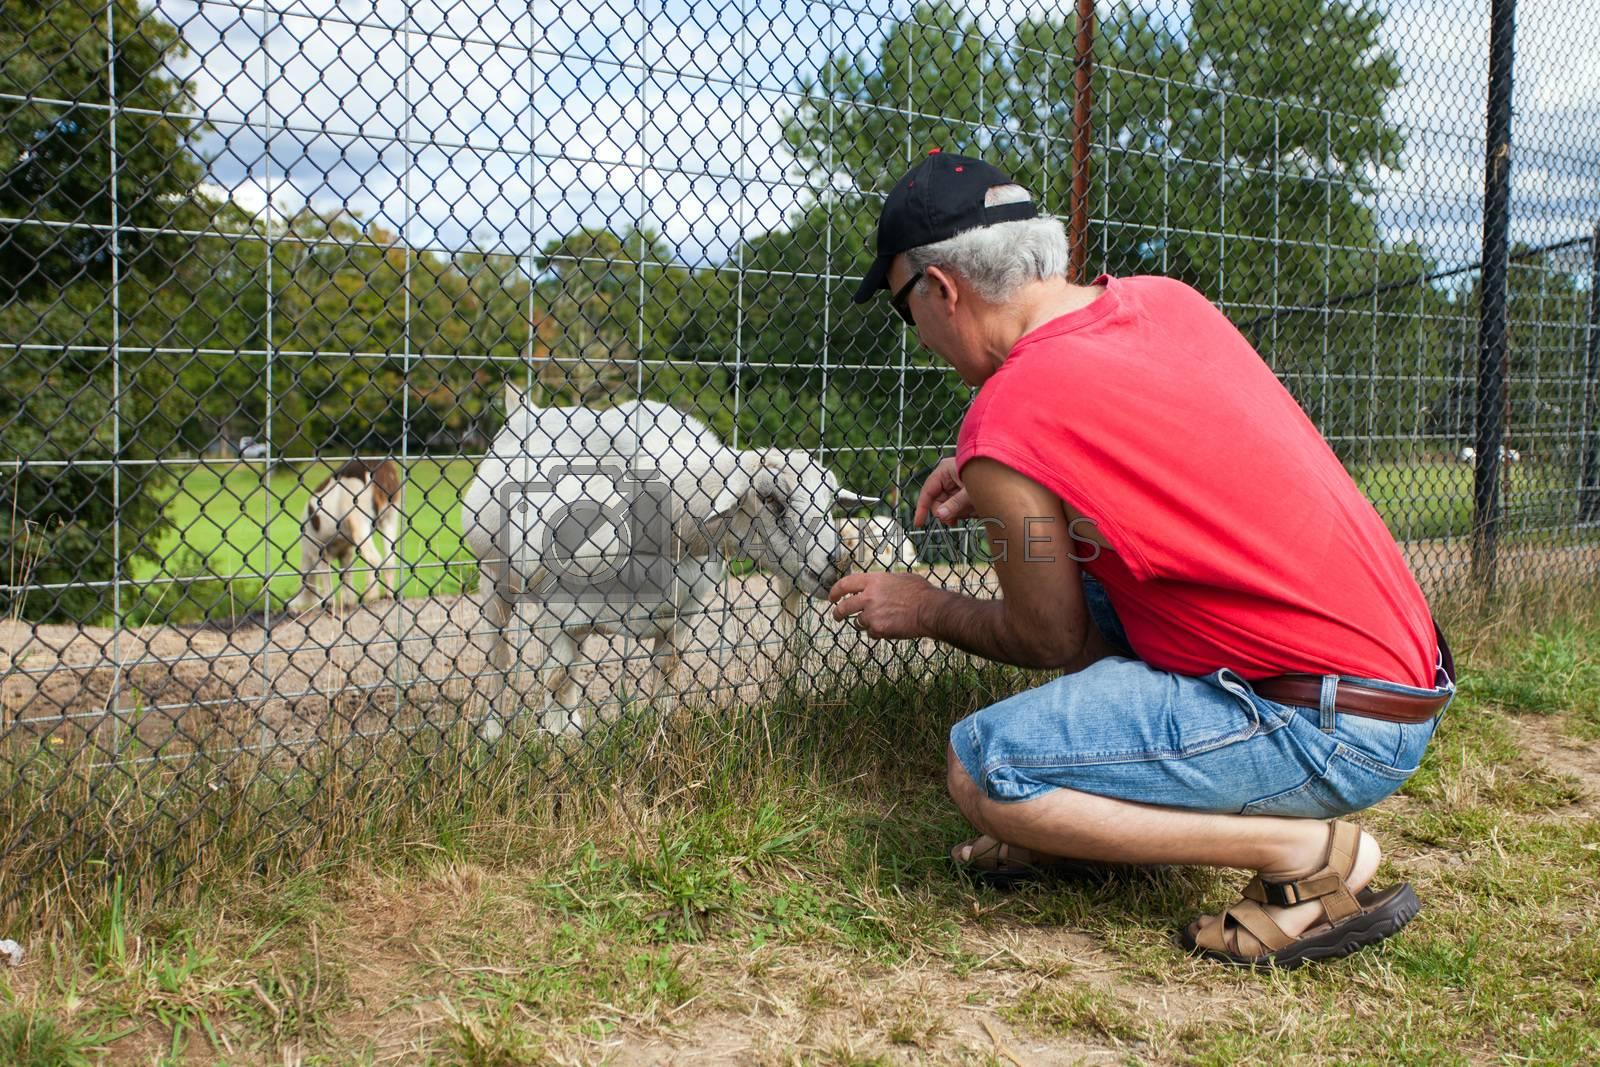 Man feeding a little goat through the fence.